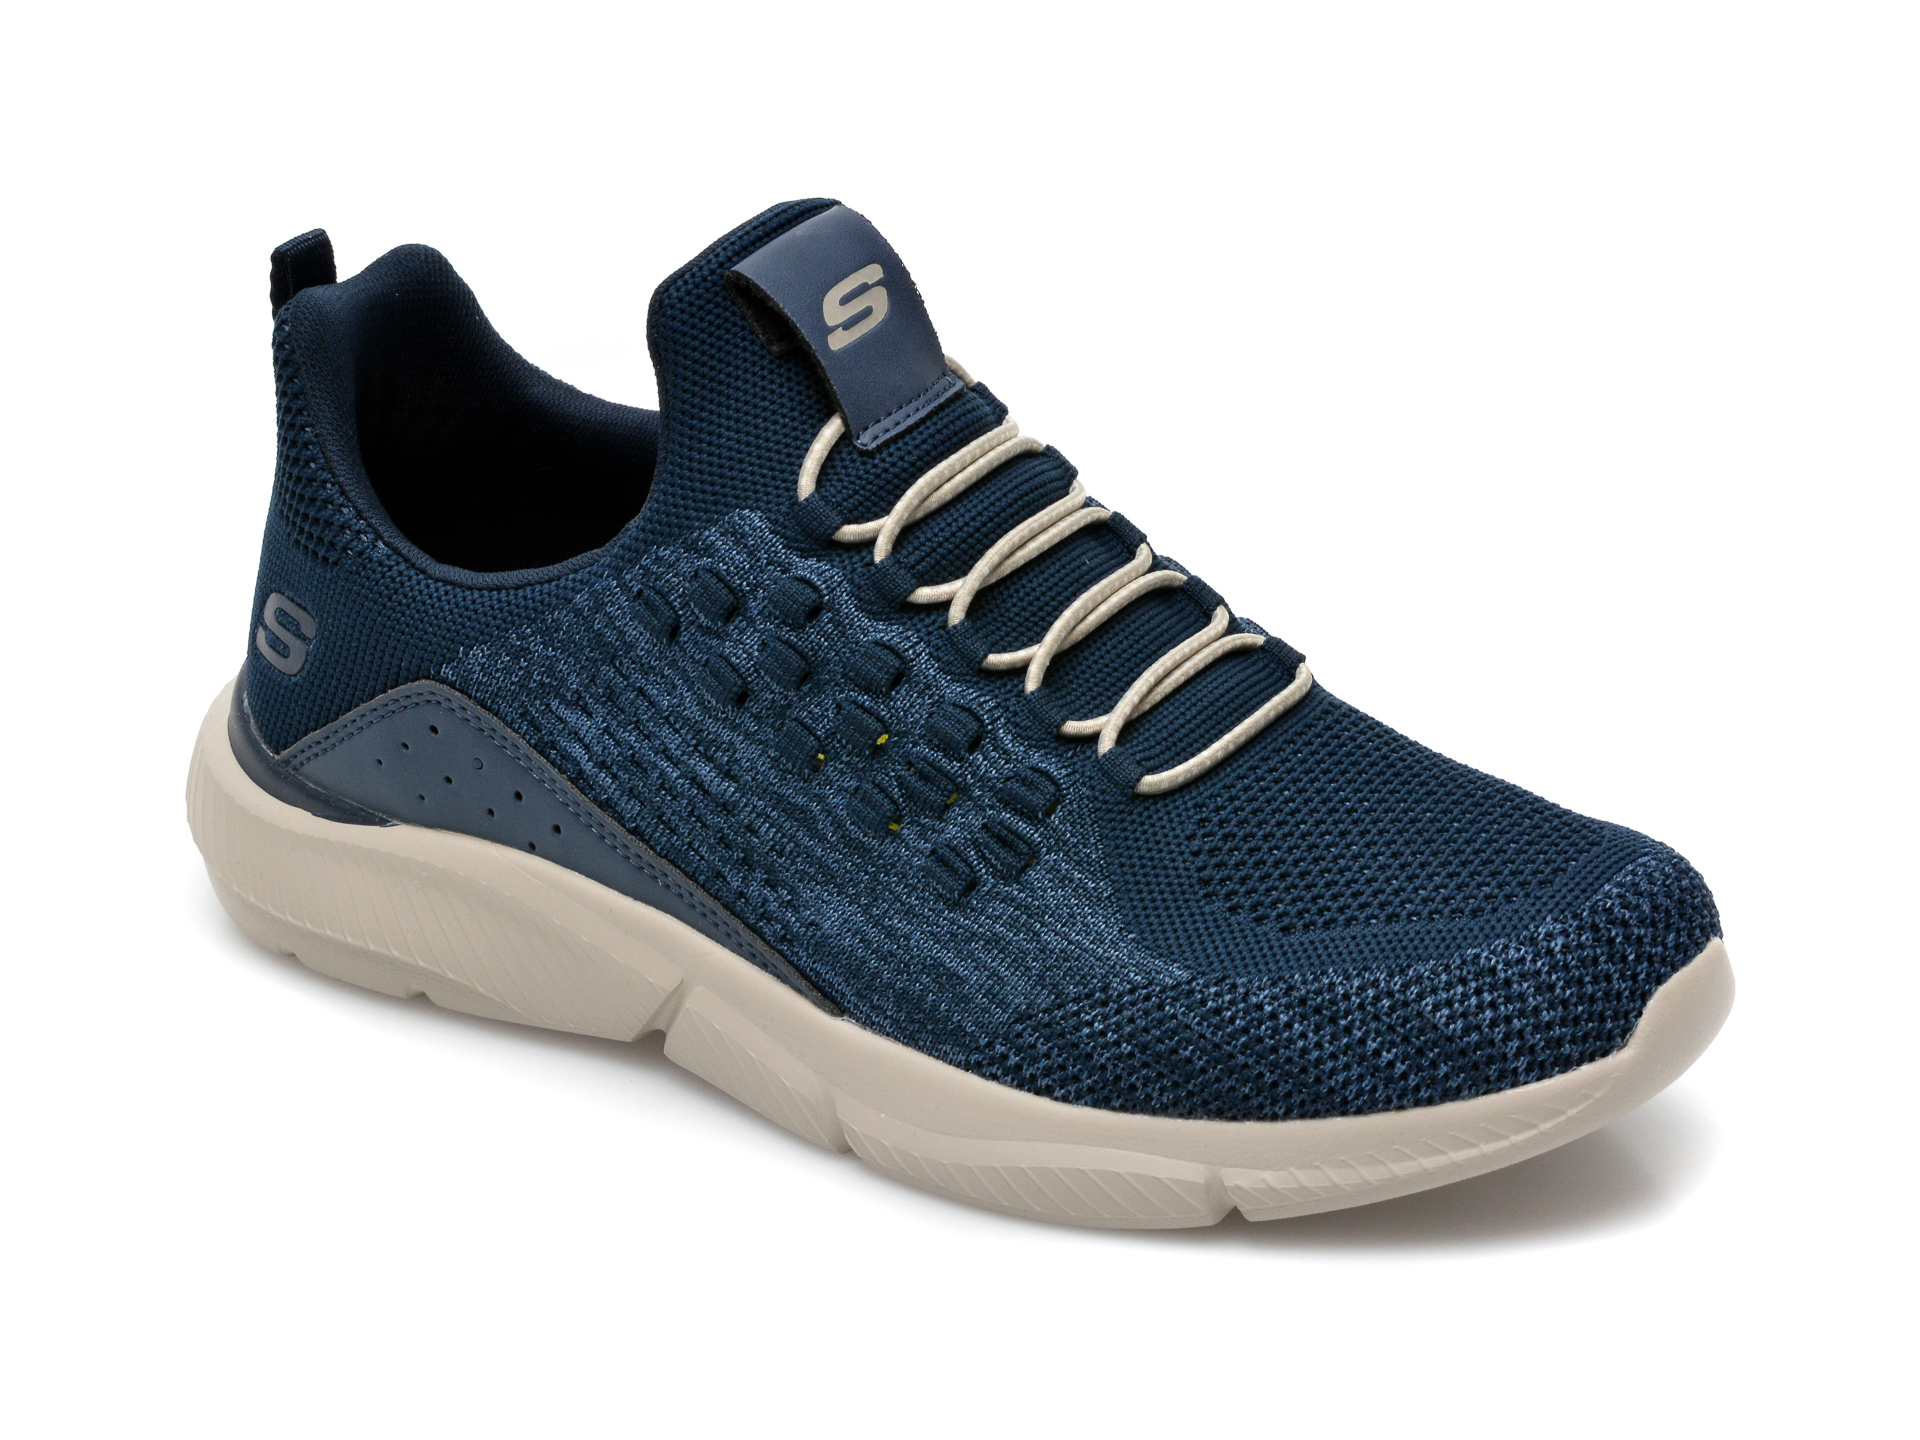 Pantofi Sport Skechers Bleumarin, Ingram Streetway, Din Material Textil